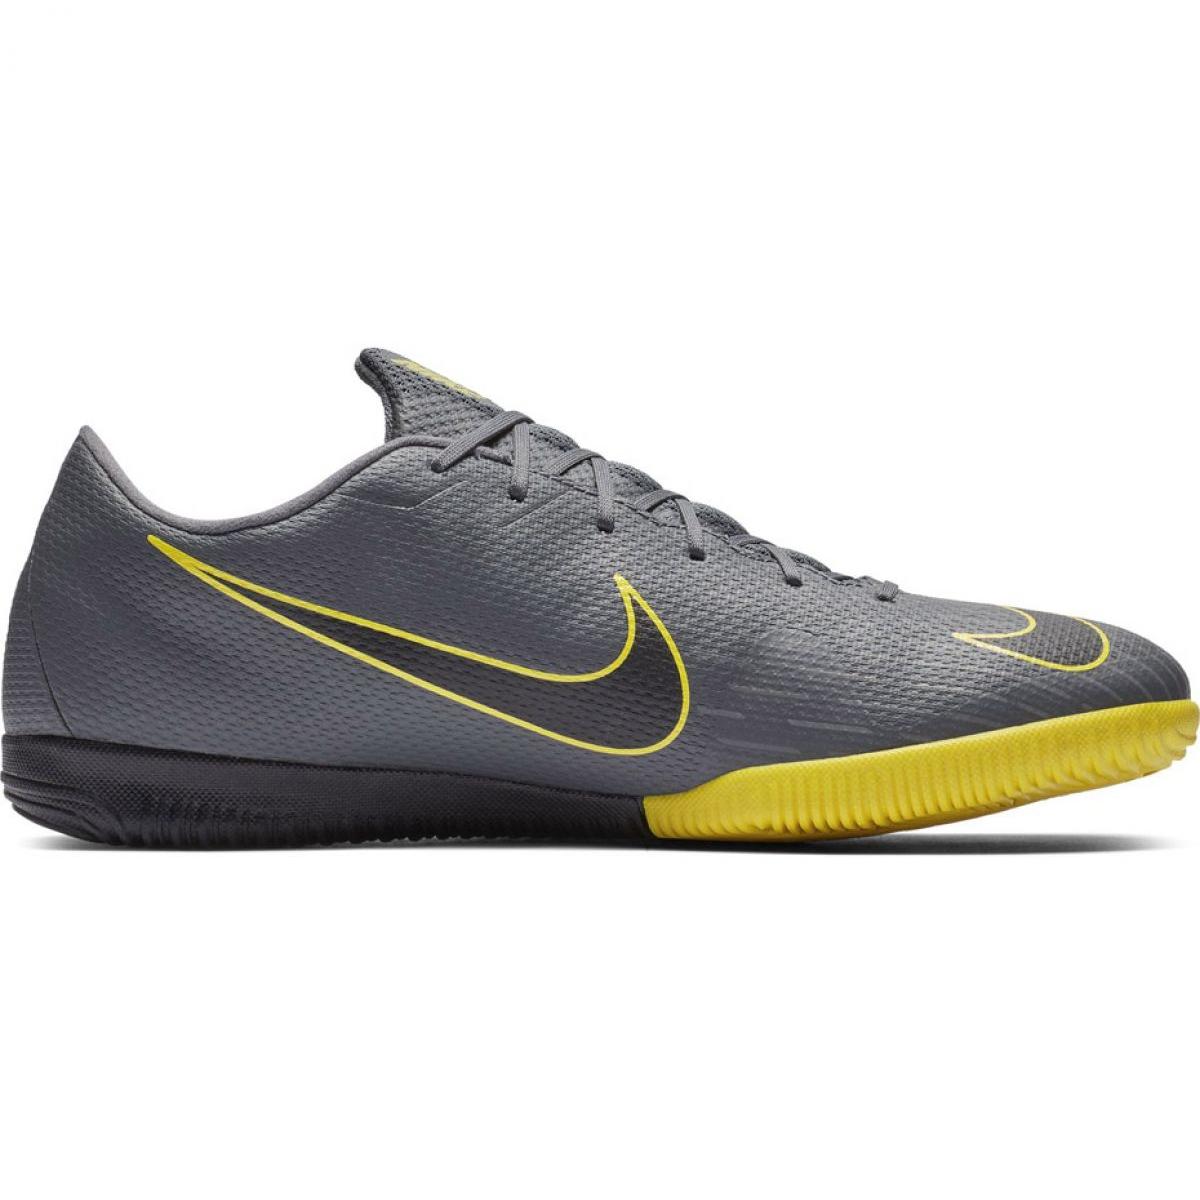 Football shoes Nike Mercurial Vapor X